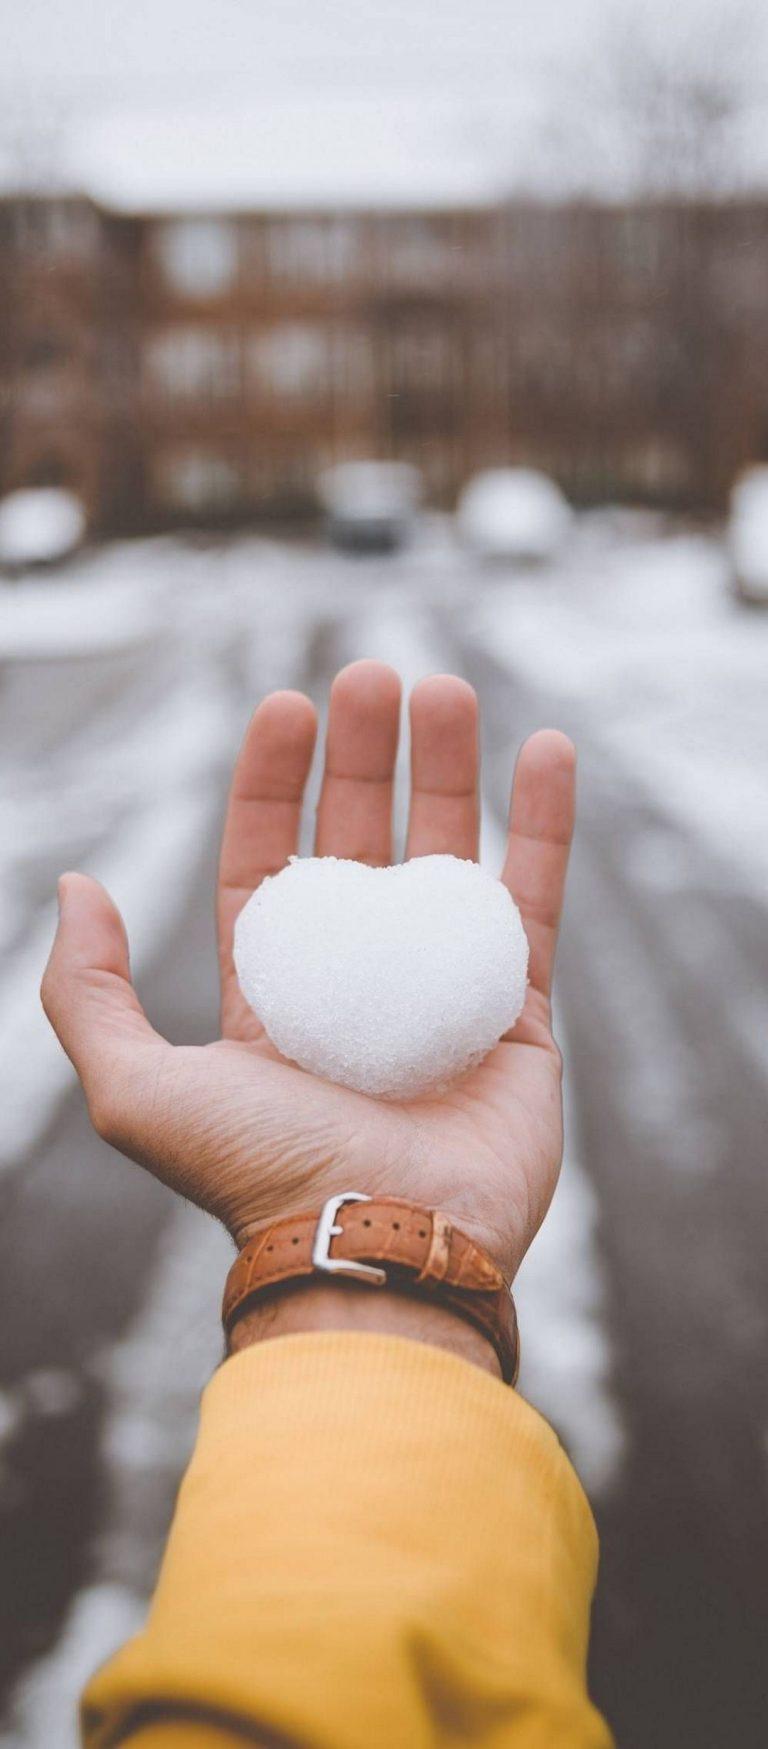 Hand Snow Heart 1080x2460 768x1749